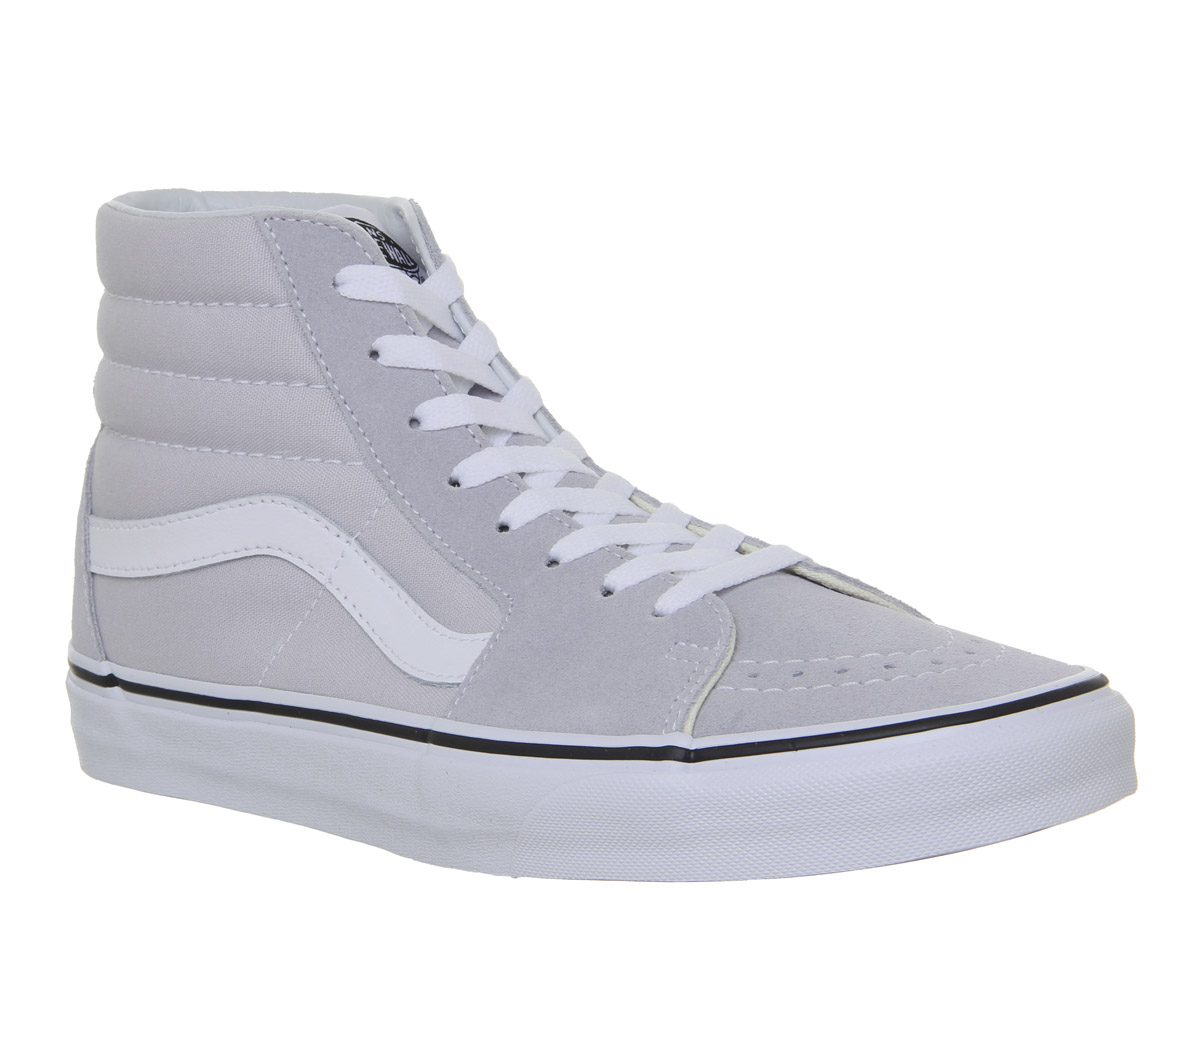 aaf82ae1eb Sentinel Thumbnail 1. Sentinel Womens Vans Sk8 Hi Trainers Gray Dawn True  White Trainers Shoes